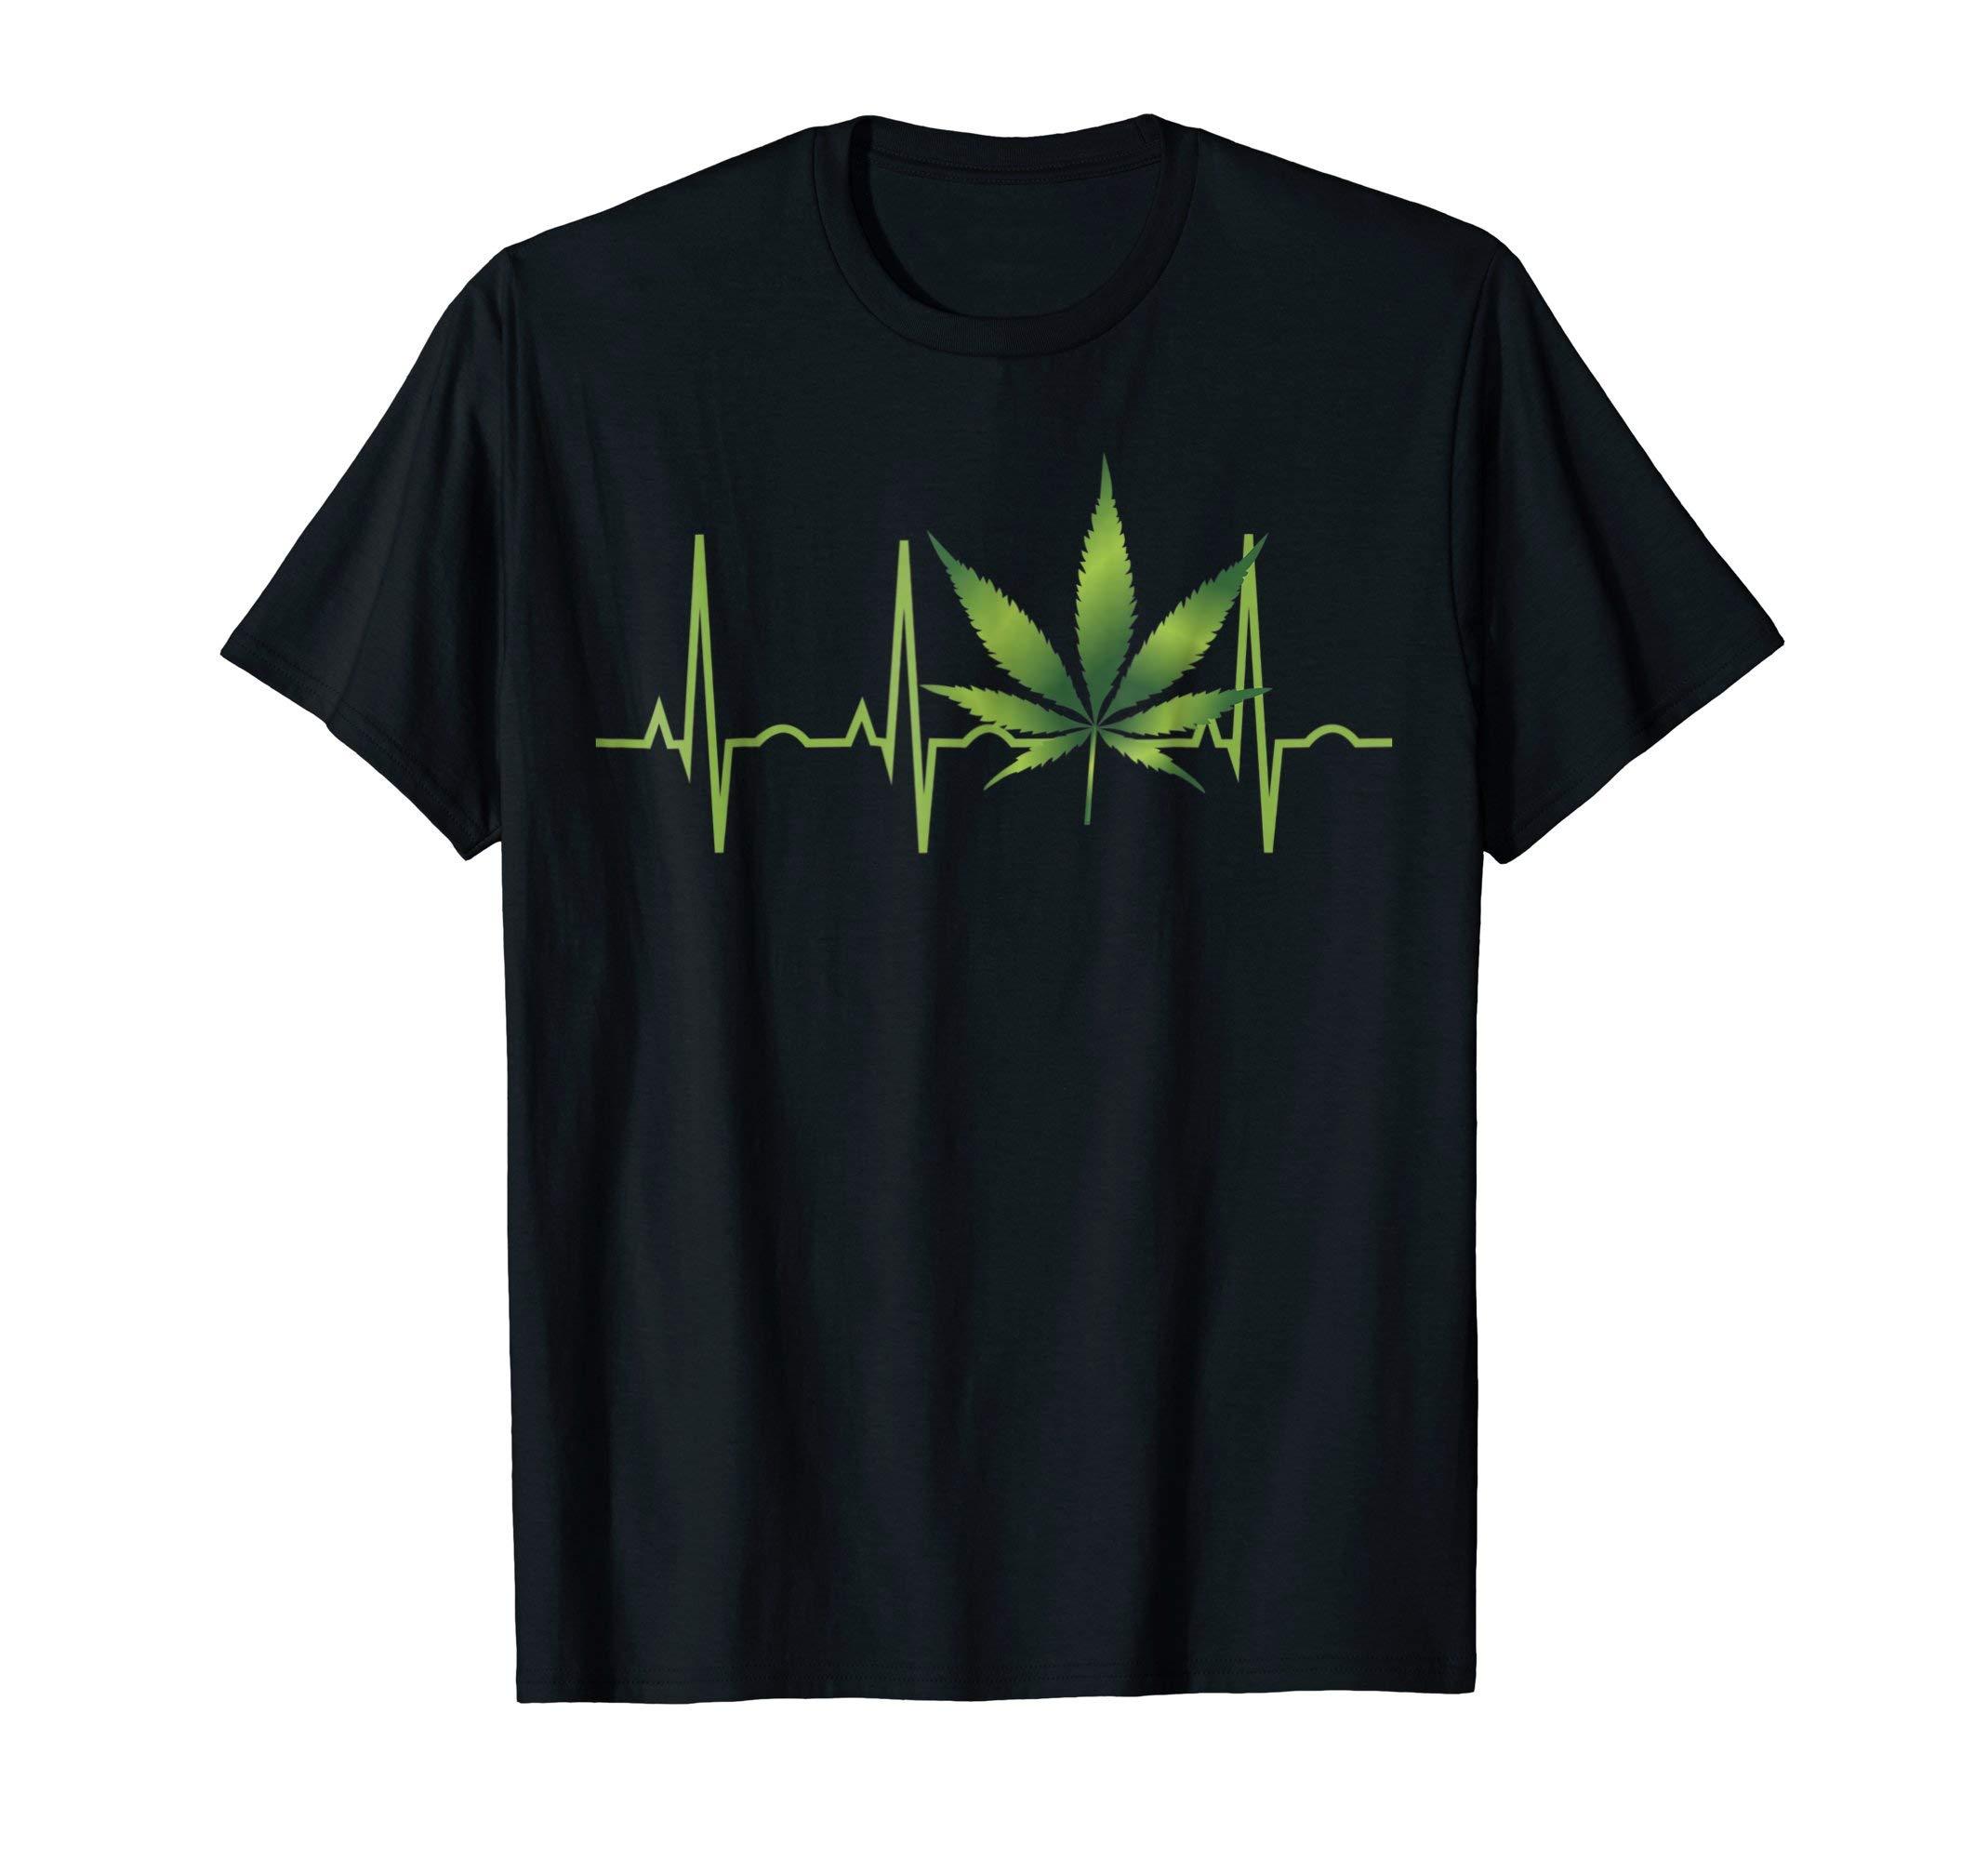 Weed Shirts for Men & Women Marijuana Leaf Heartbeat Gift